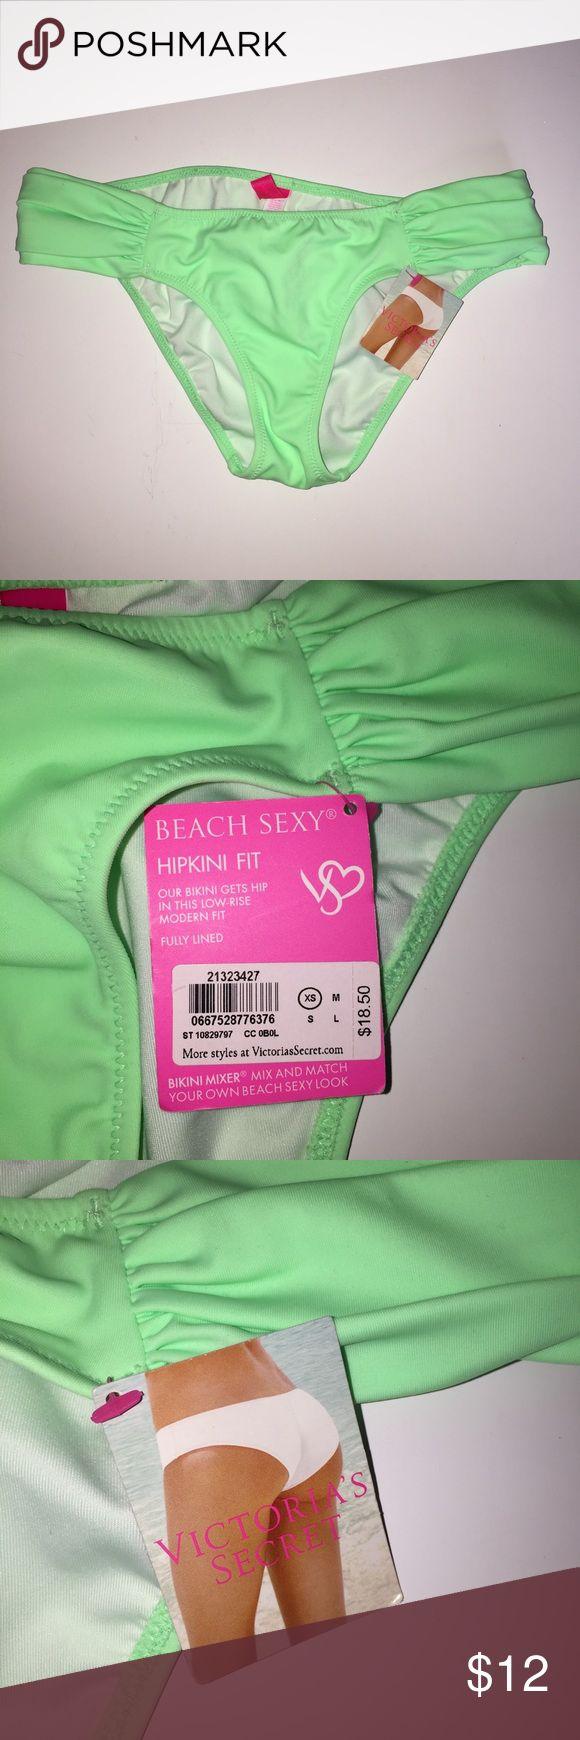 Victorias Secret Hipkini Green Bikini Bottom XS NEW Victorias Secret Hipkini Green Bikini Bottom XS Nwt BEACH SEXY Victoria's Secret Swim Bikinis